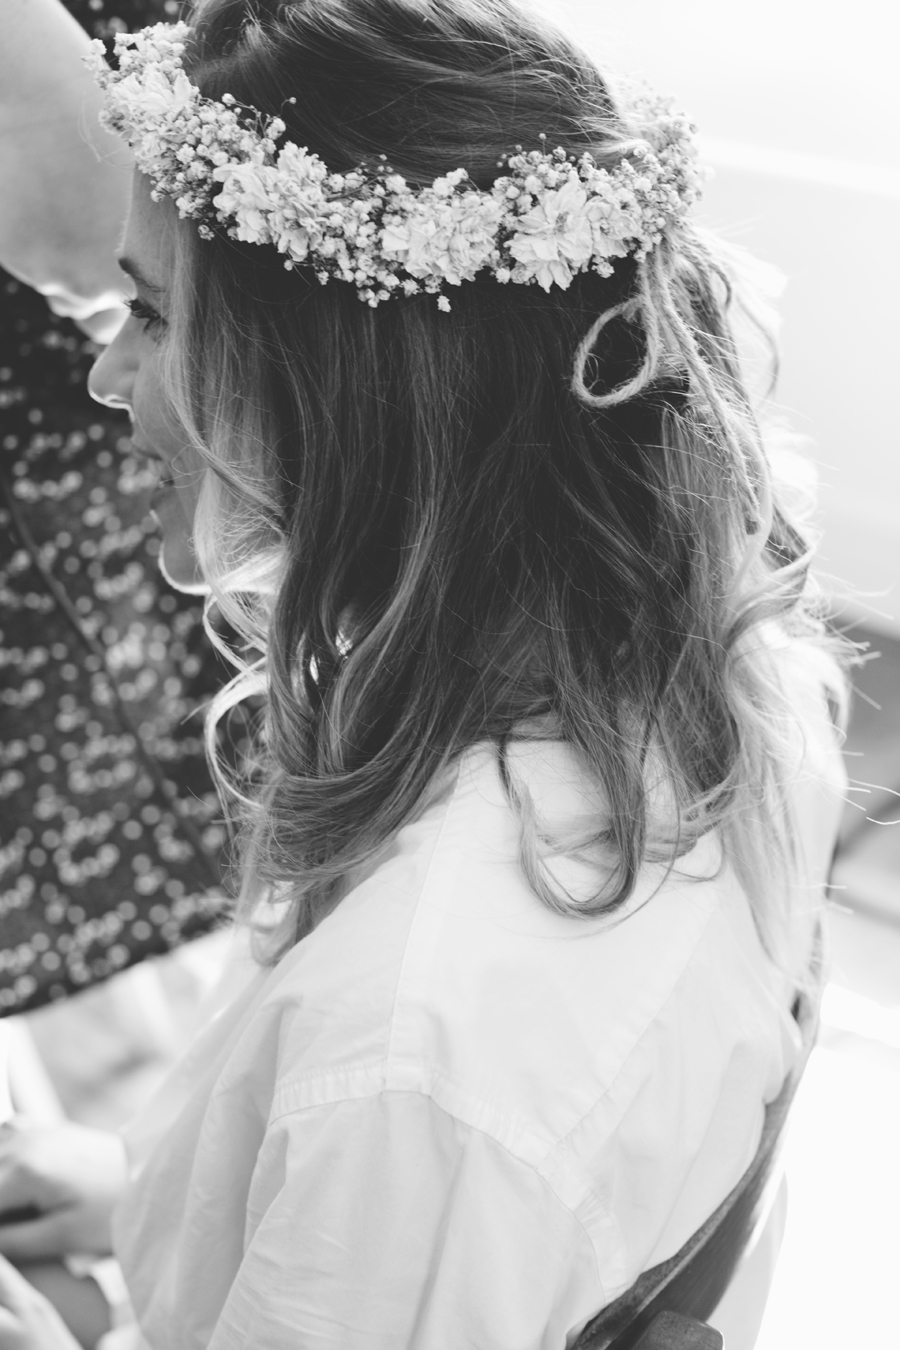 celine_marks_mariage_aurelie_keil_36